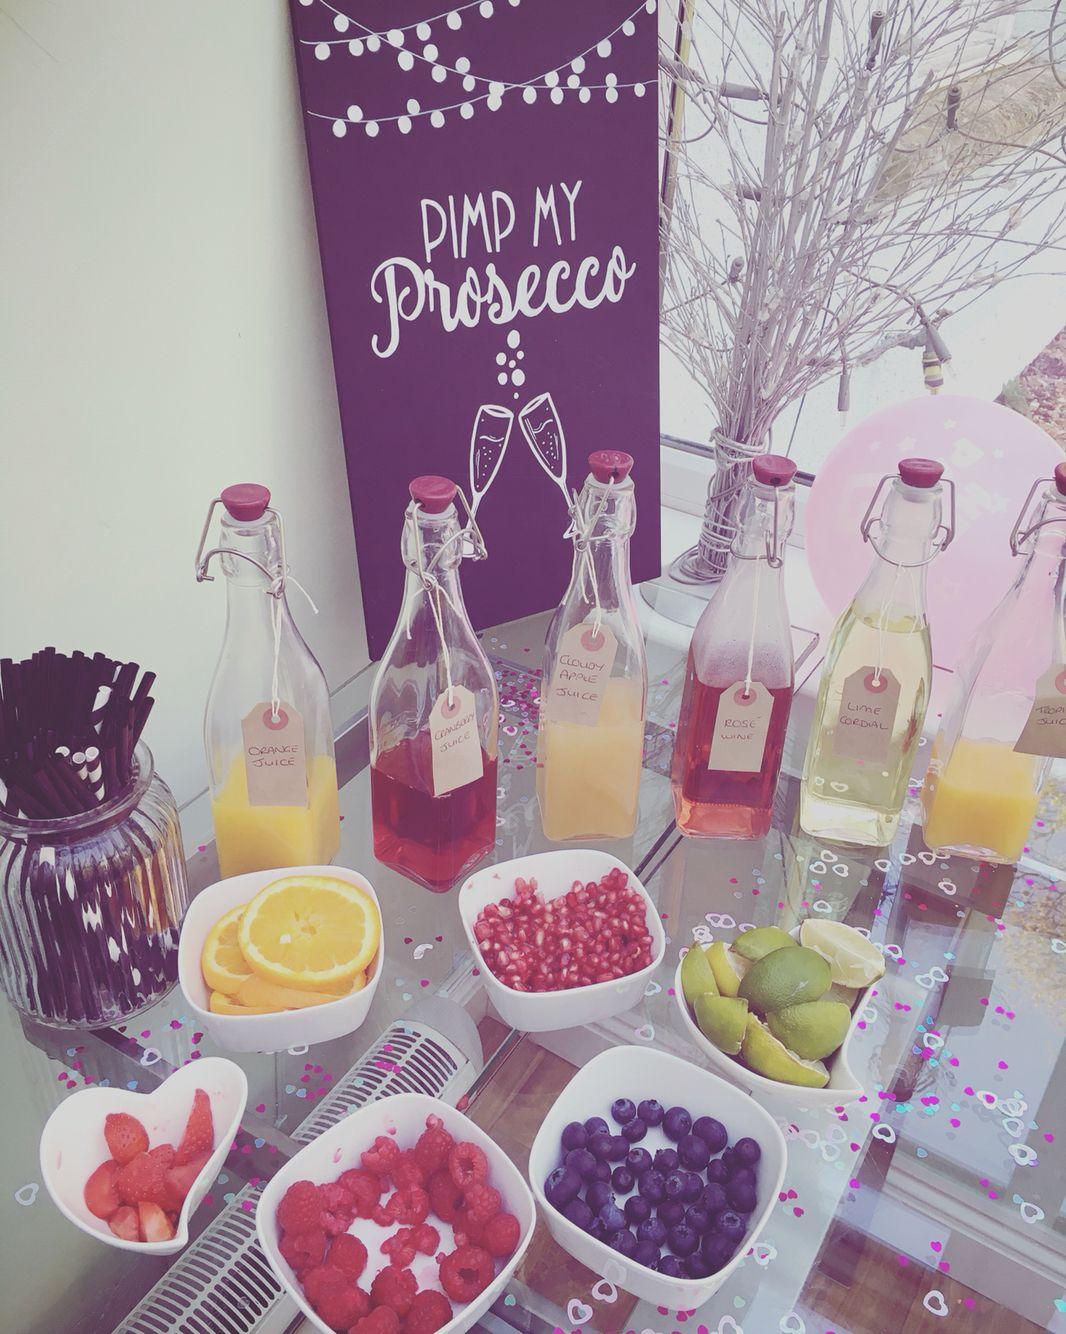 Pimp my prosecco wedding drinks idea | Hochzeit | Pinterest ...